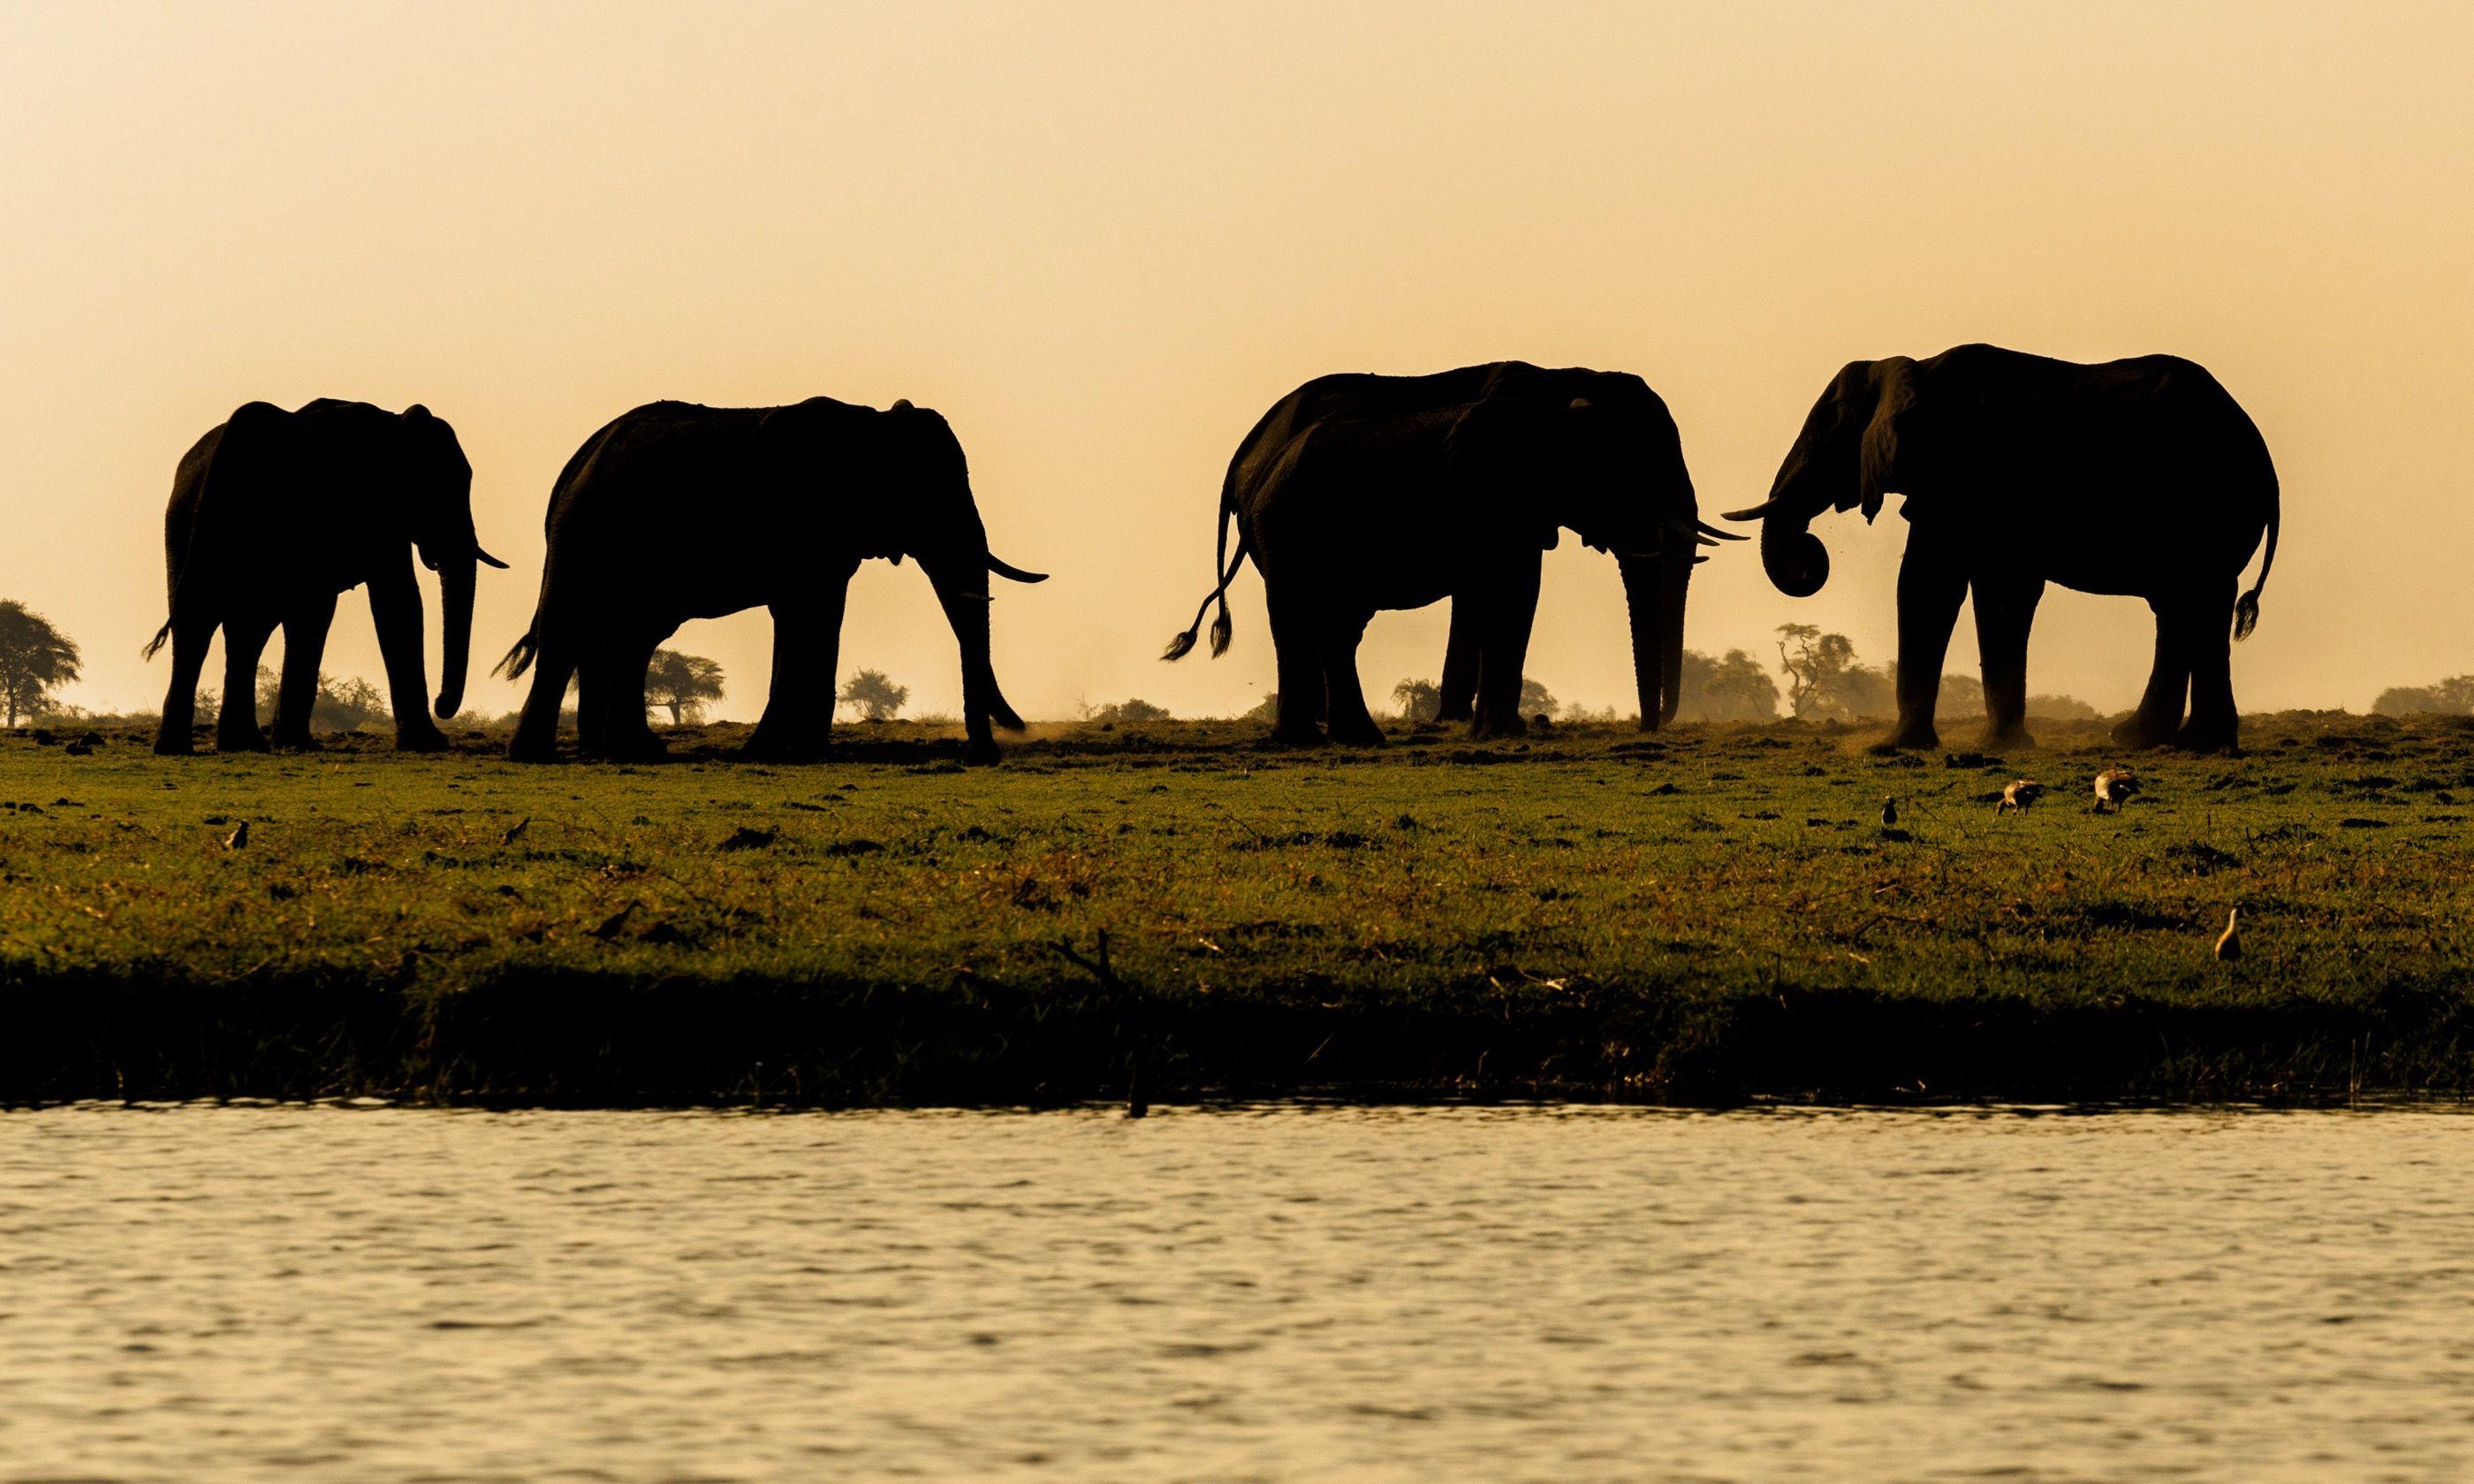 Elephants in Chobe National Park (Shutterstock.com)